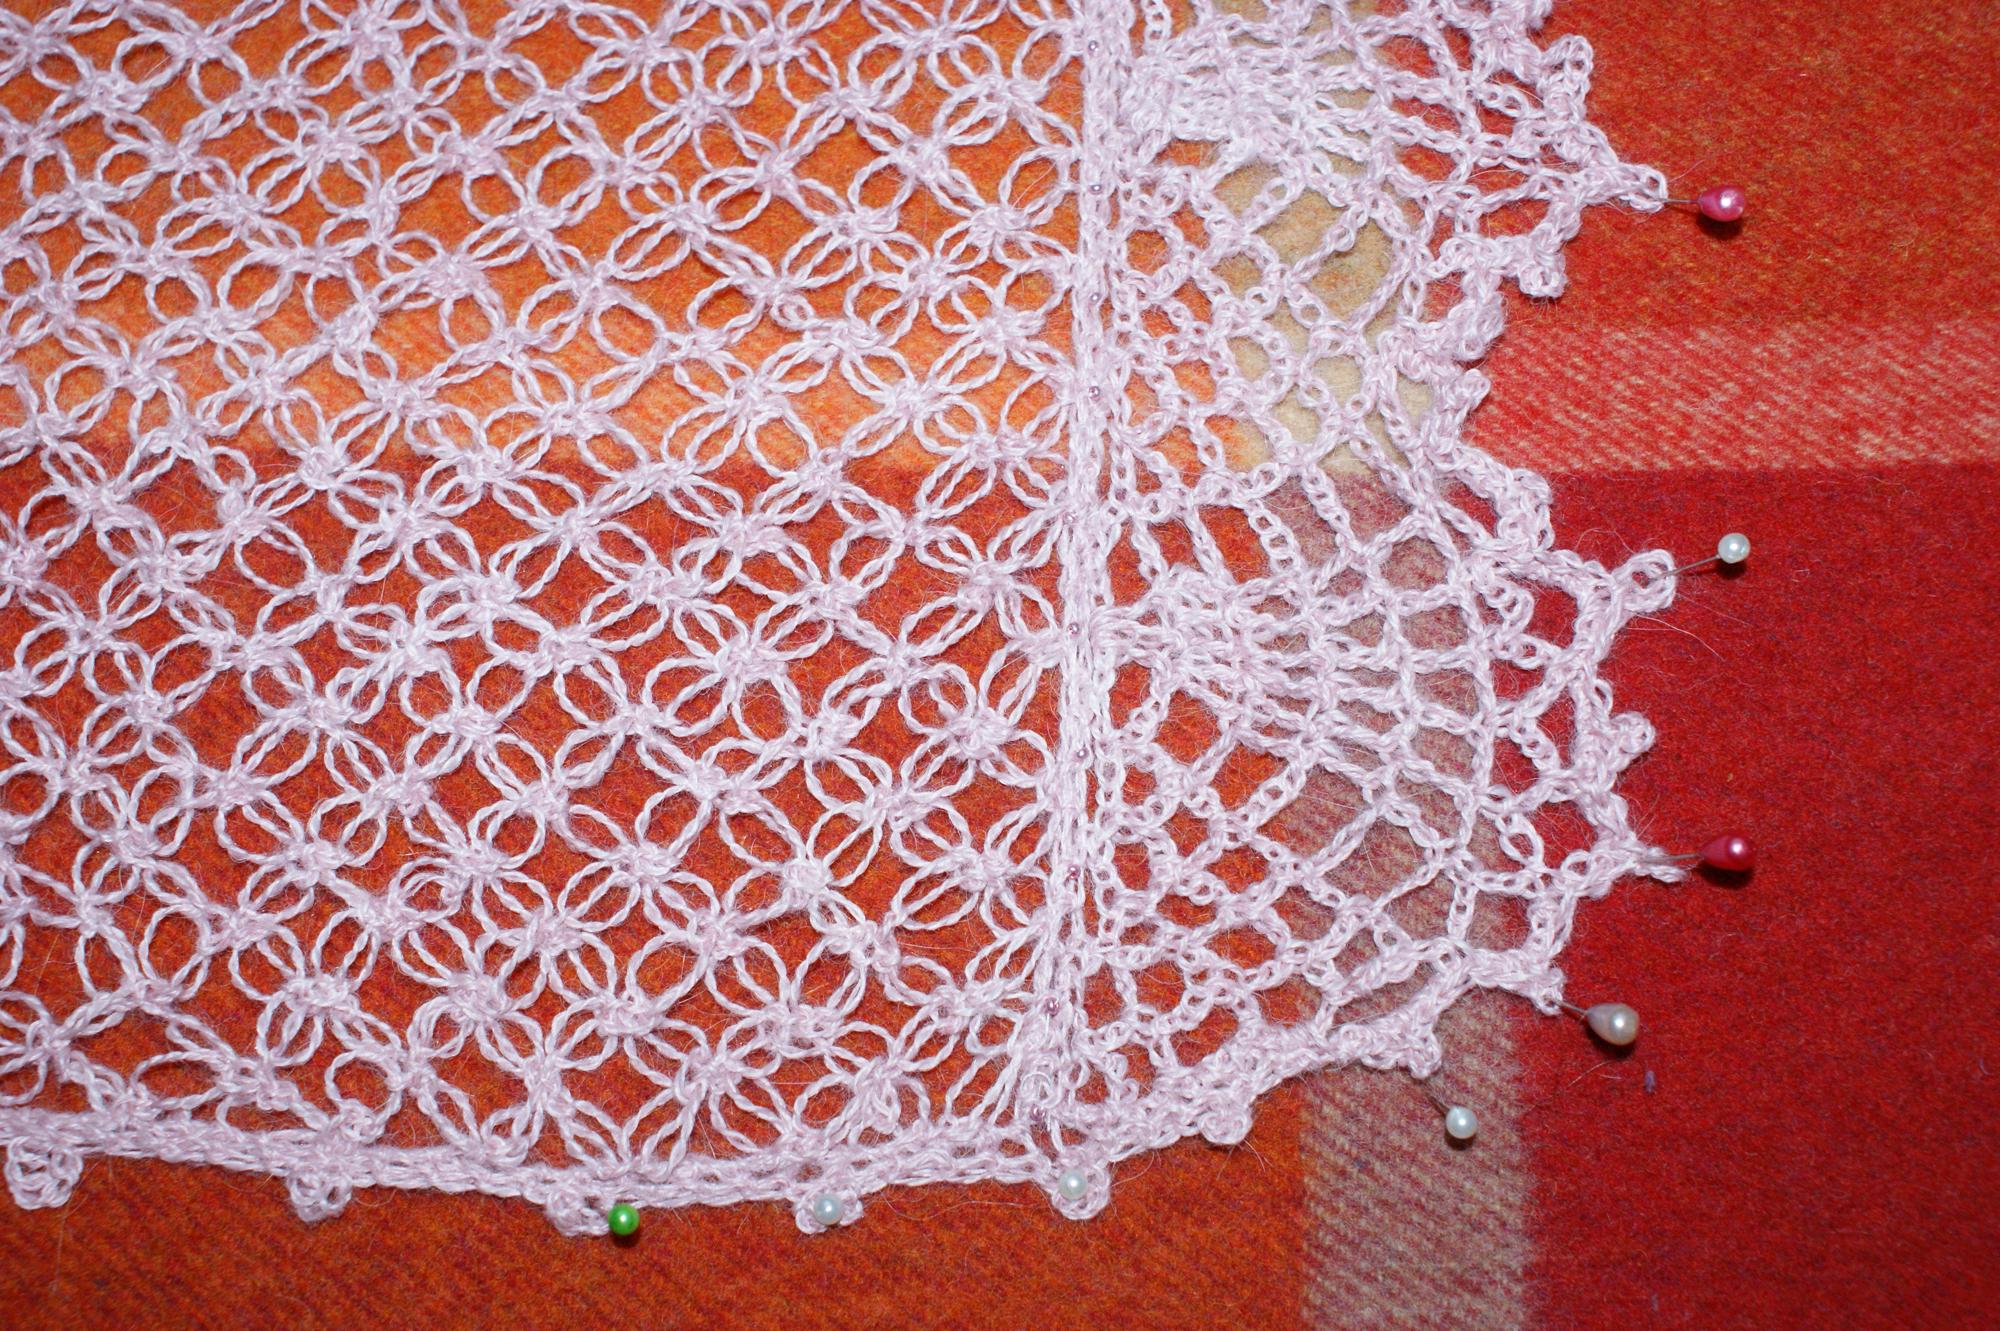 Lace crochet stitch adaliza i added a deeper lace bankloansurffo Gallery